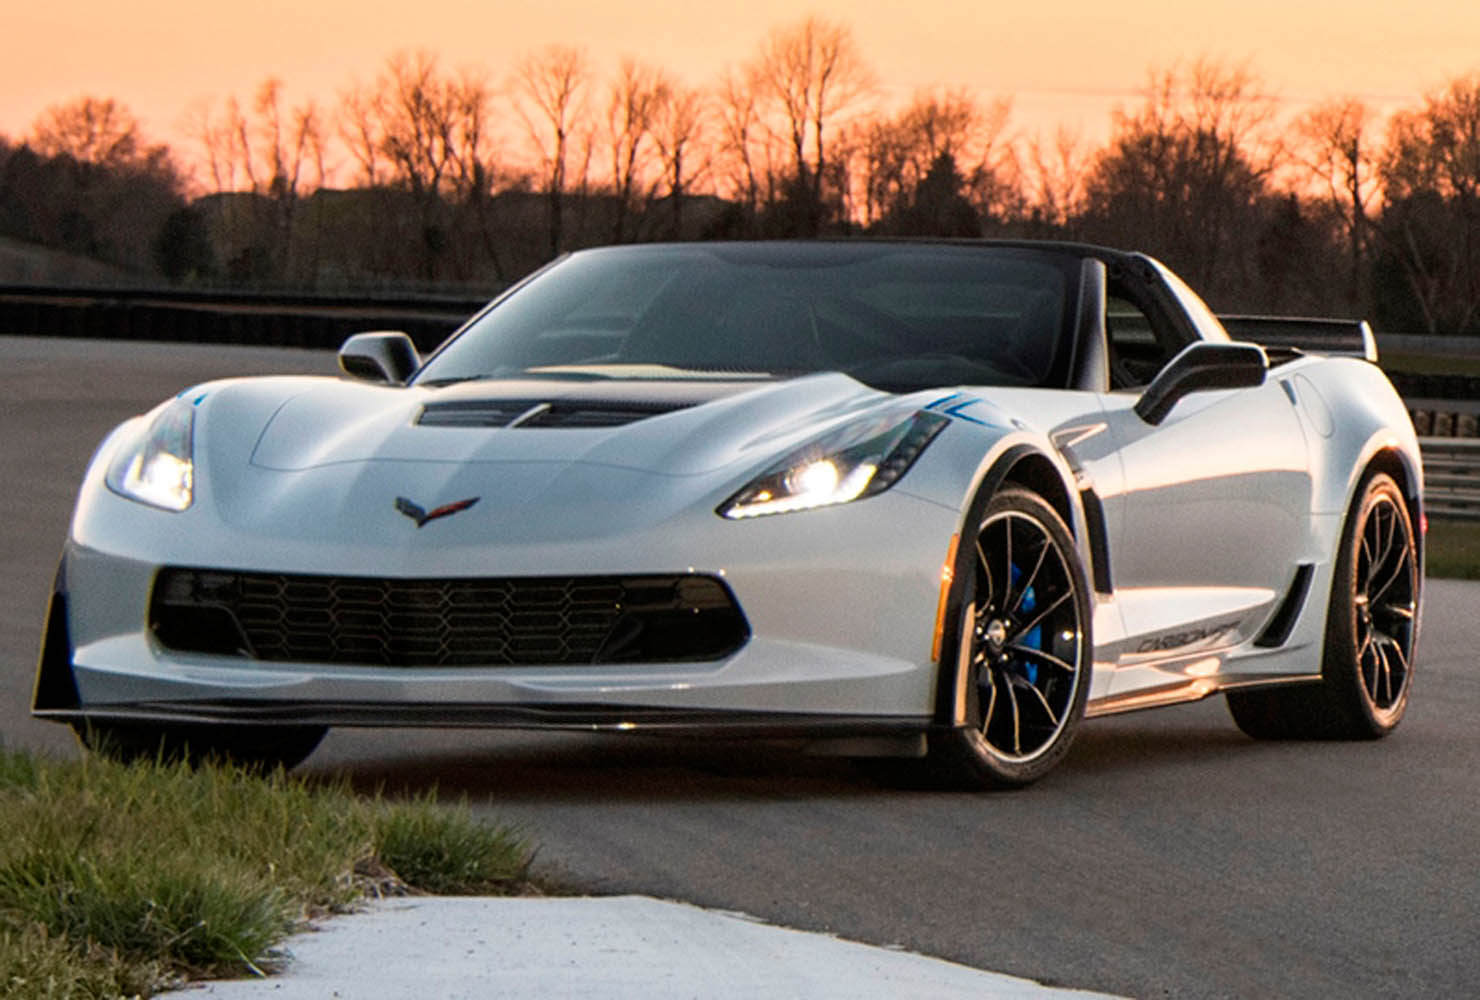 Kekurangan Chevrolet Corvette 2018 Spesifikasi